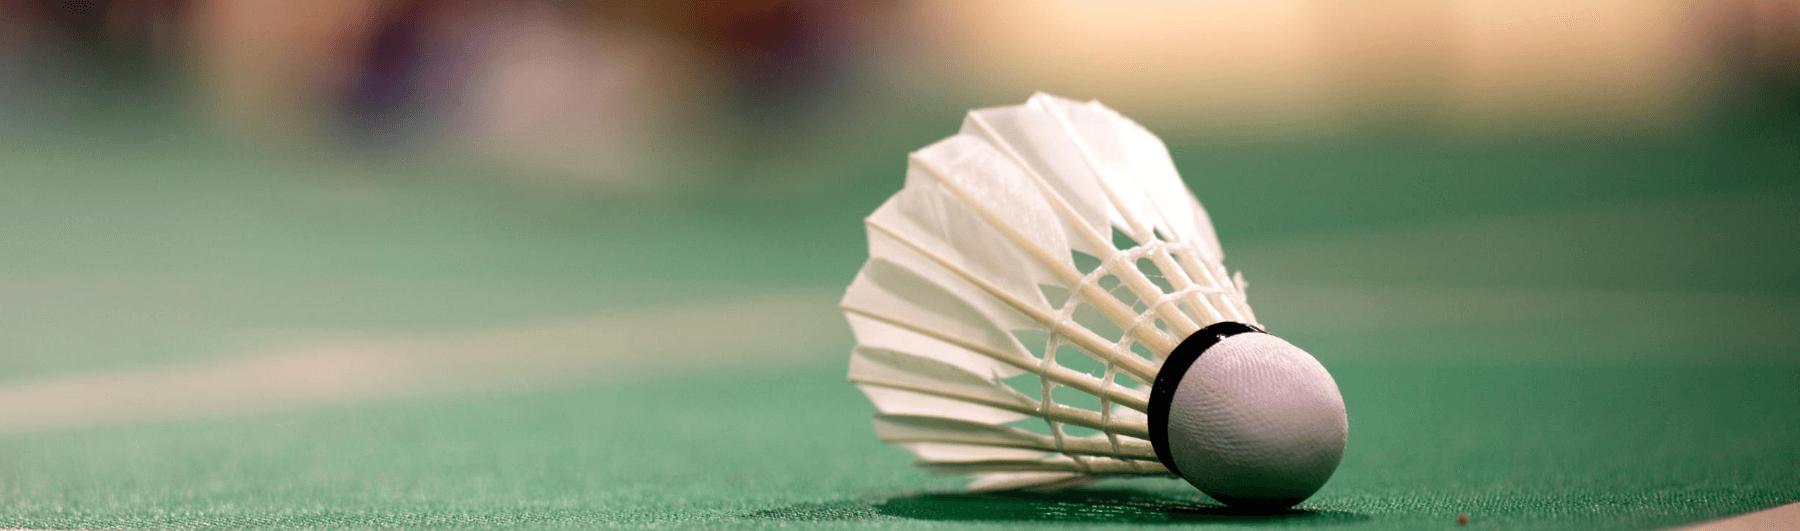 Badminton Data Coverage